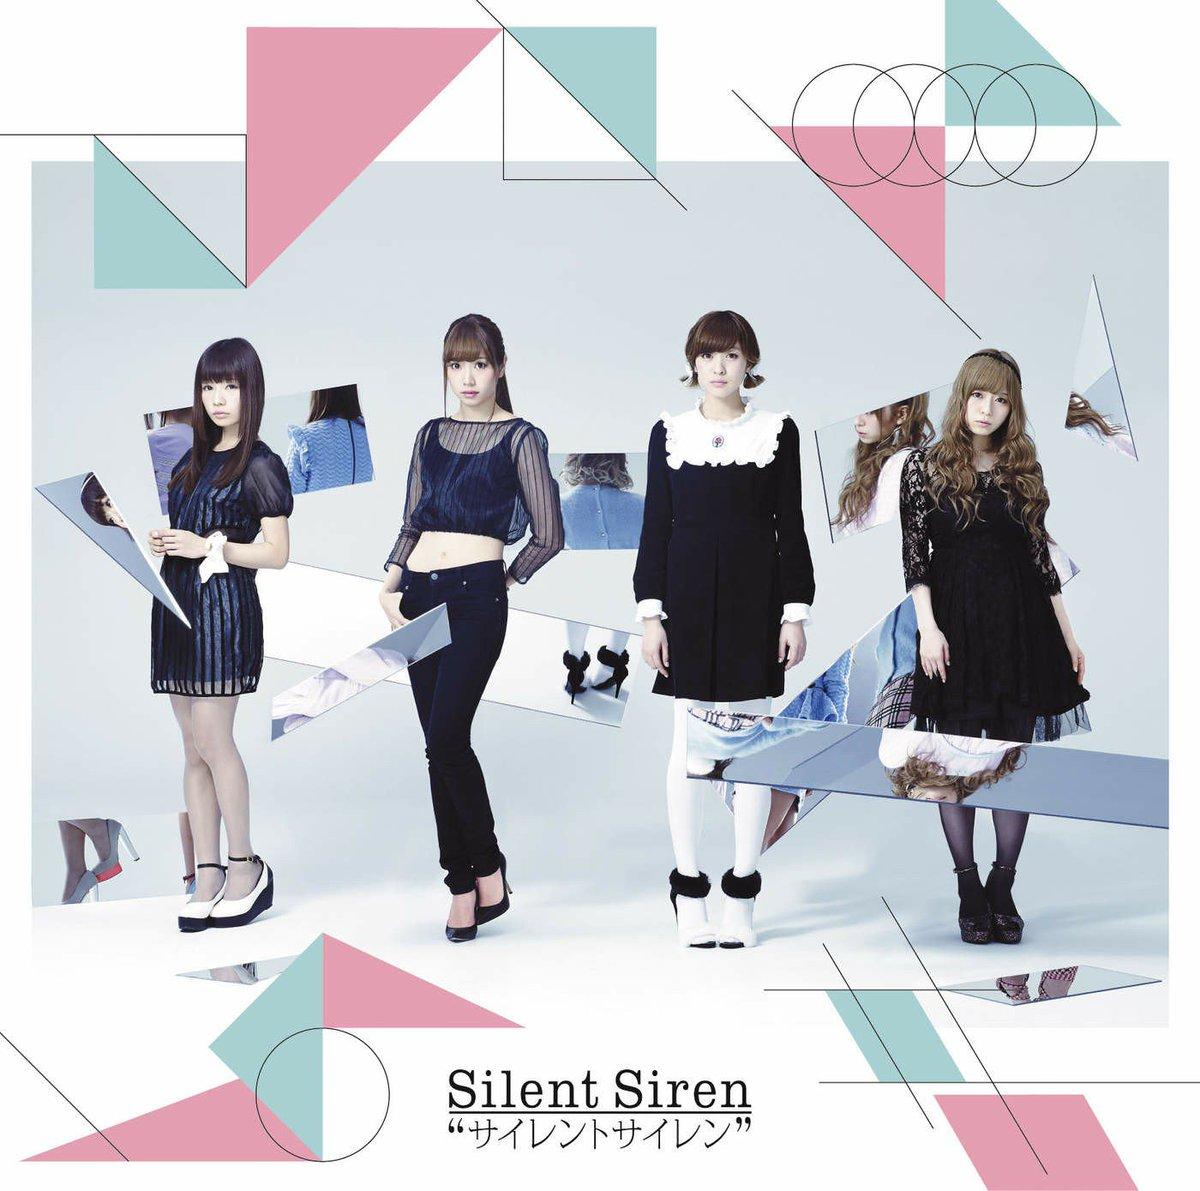 test ツイッターメディア - #NowPlaying ストロベリームーン - Silent Siren (サイレントサイレン) https://t.co/y4tXBRgyaU